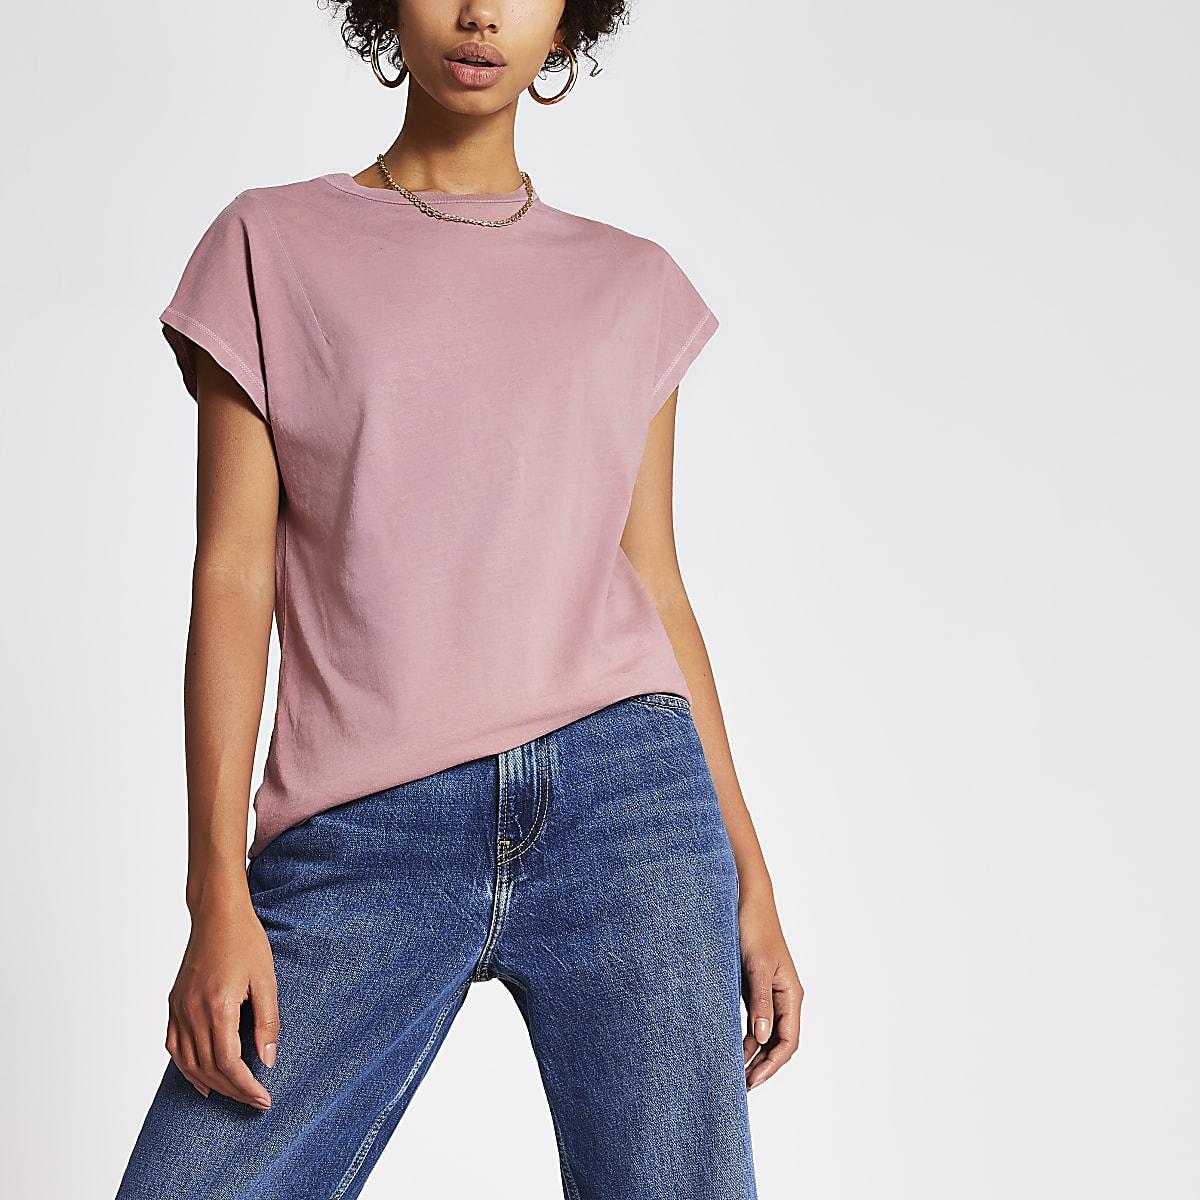 Pepe Jeans x Dua Lipa - T-shirt rose